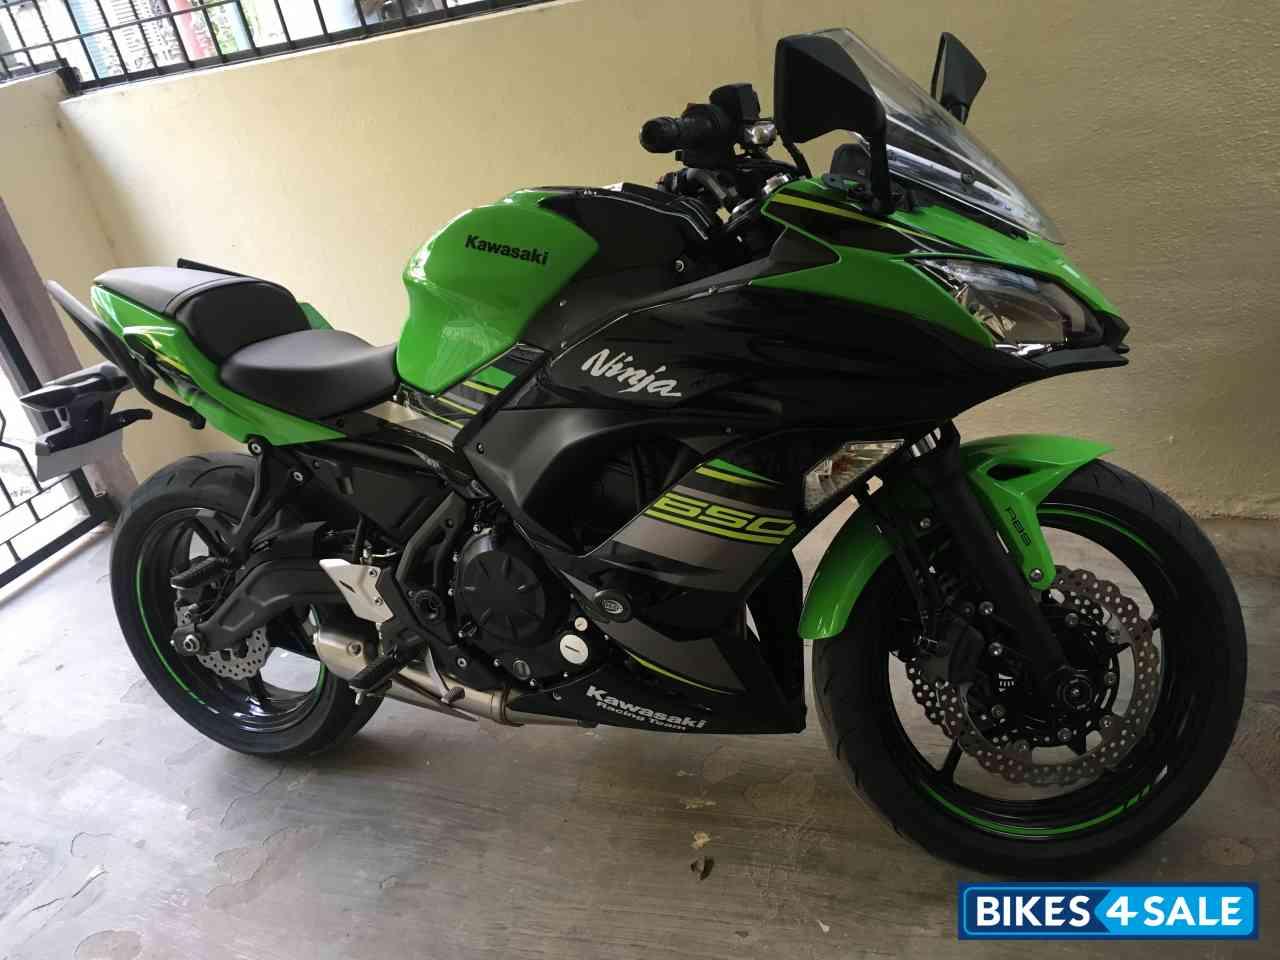 Used 2018 Model Kawasaki Ninja 650r For Sale In Bangalore Id 217172